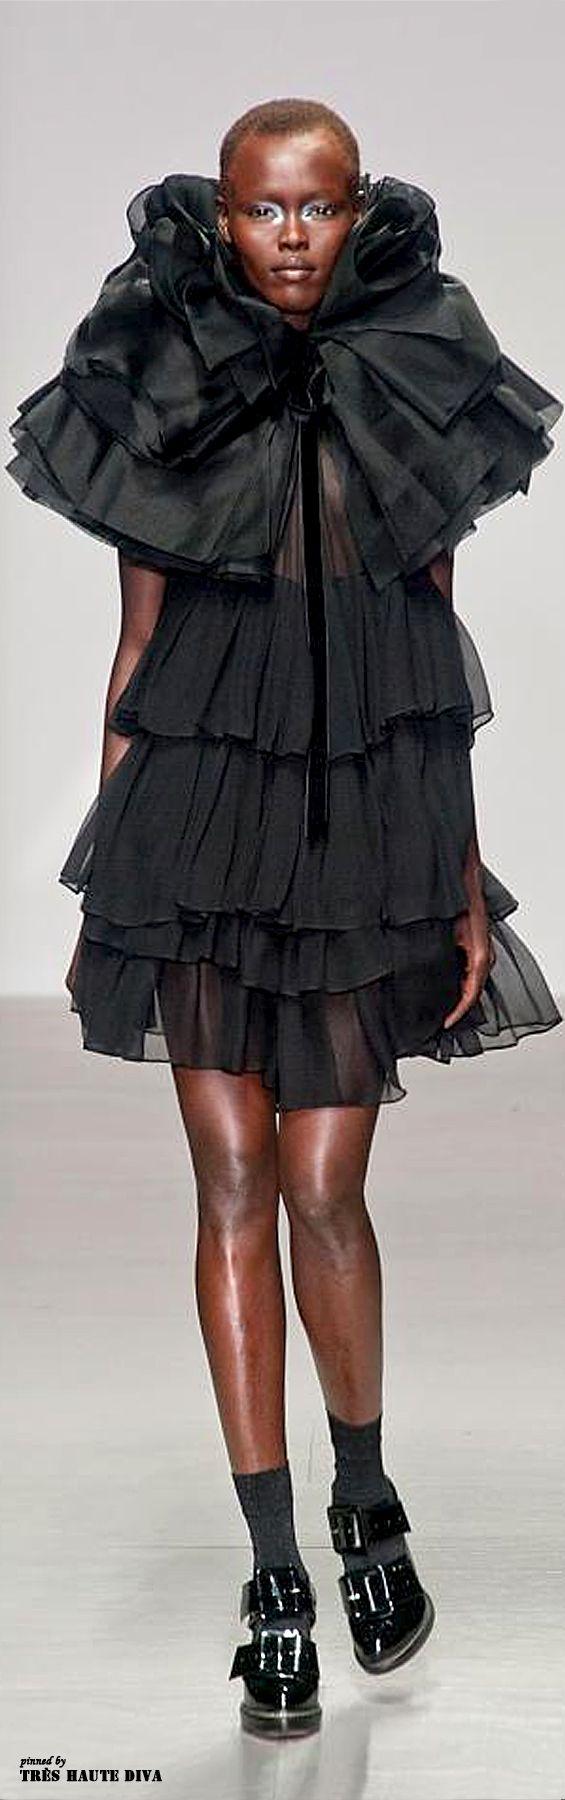 #London Fashion Week John Rocha Fall/Winter 2014 RTW